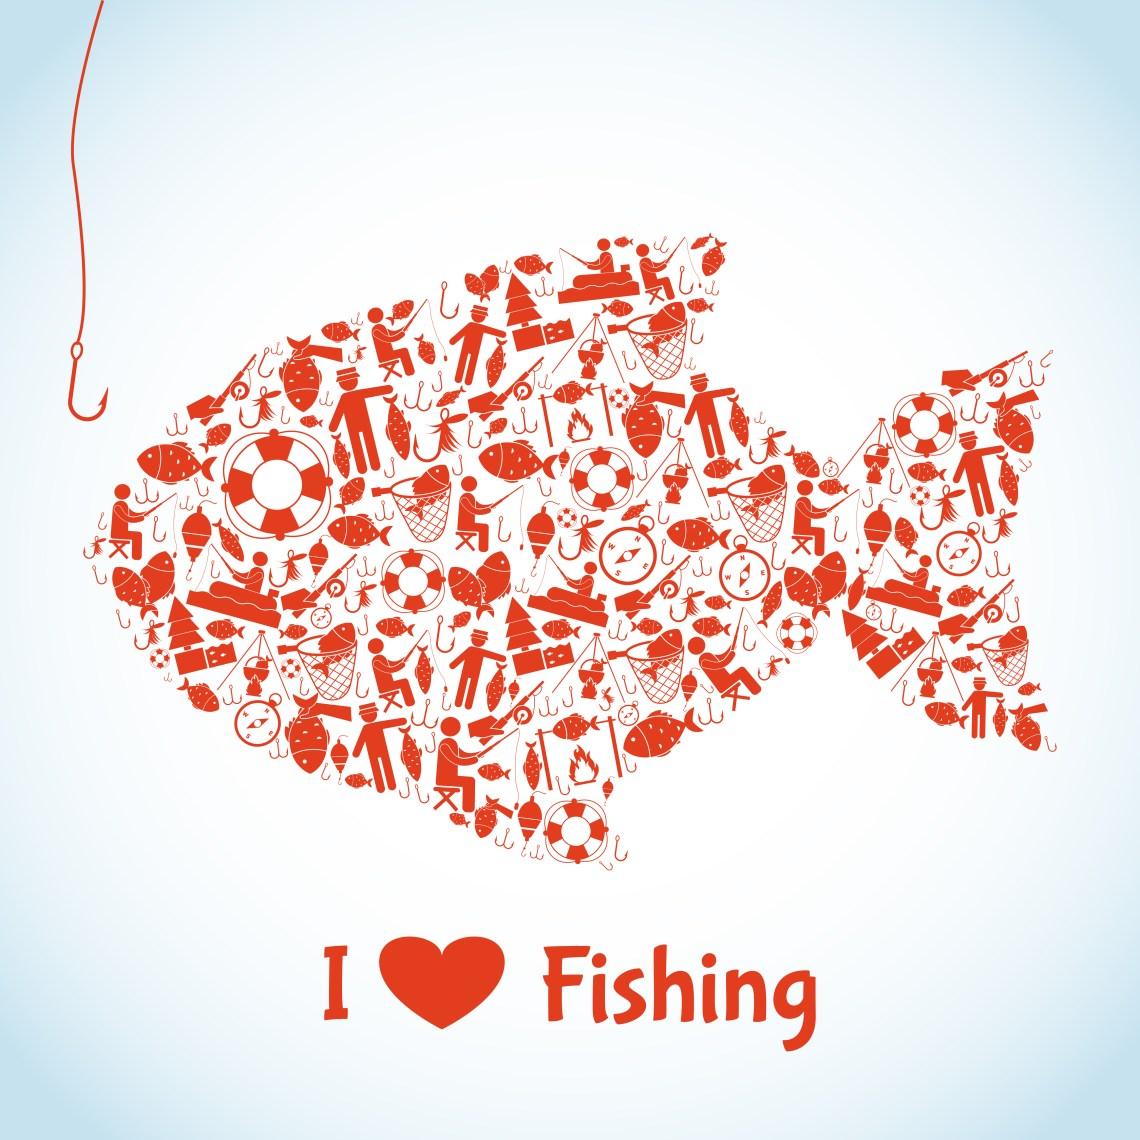 Download Love Fishing Concept - Download Free Vectors, Clipart ...